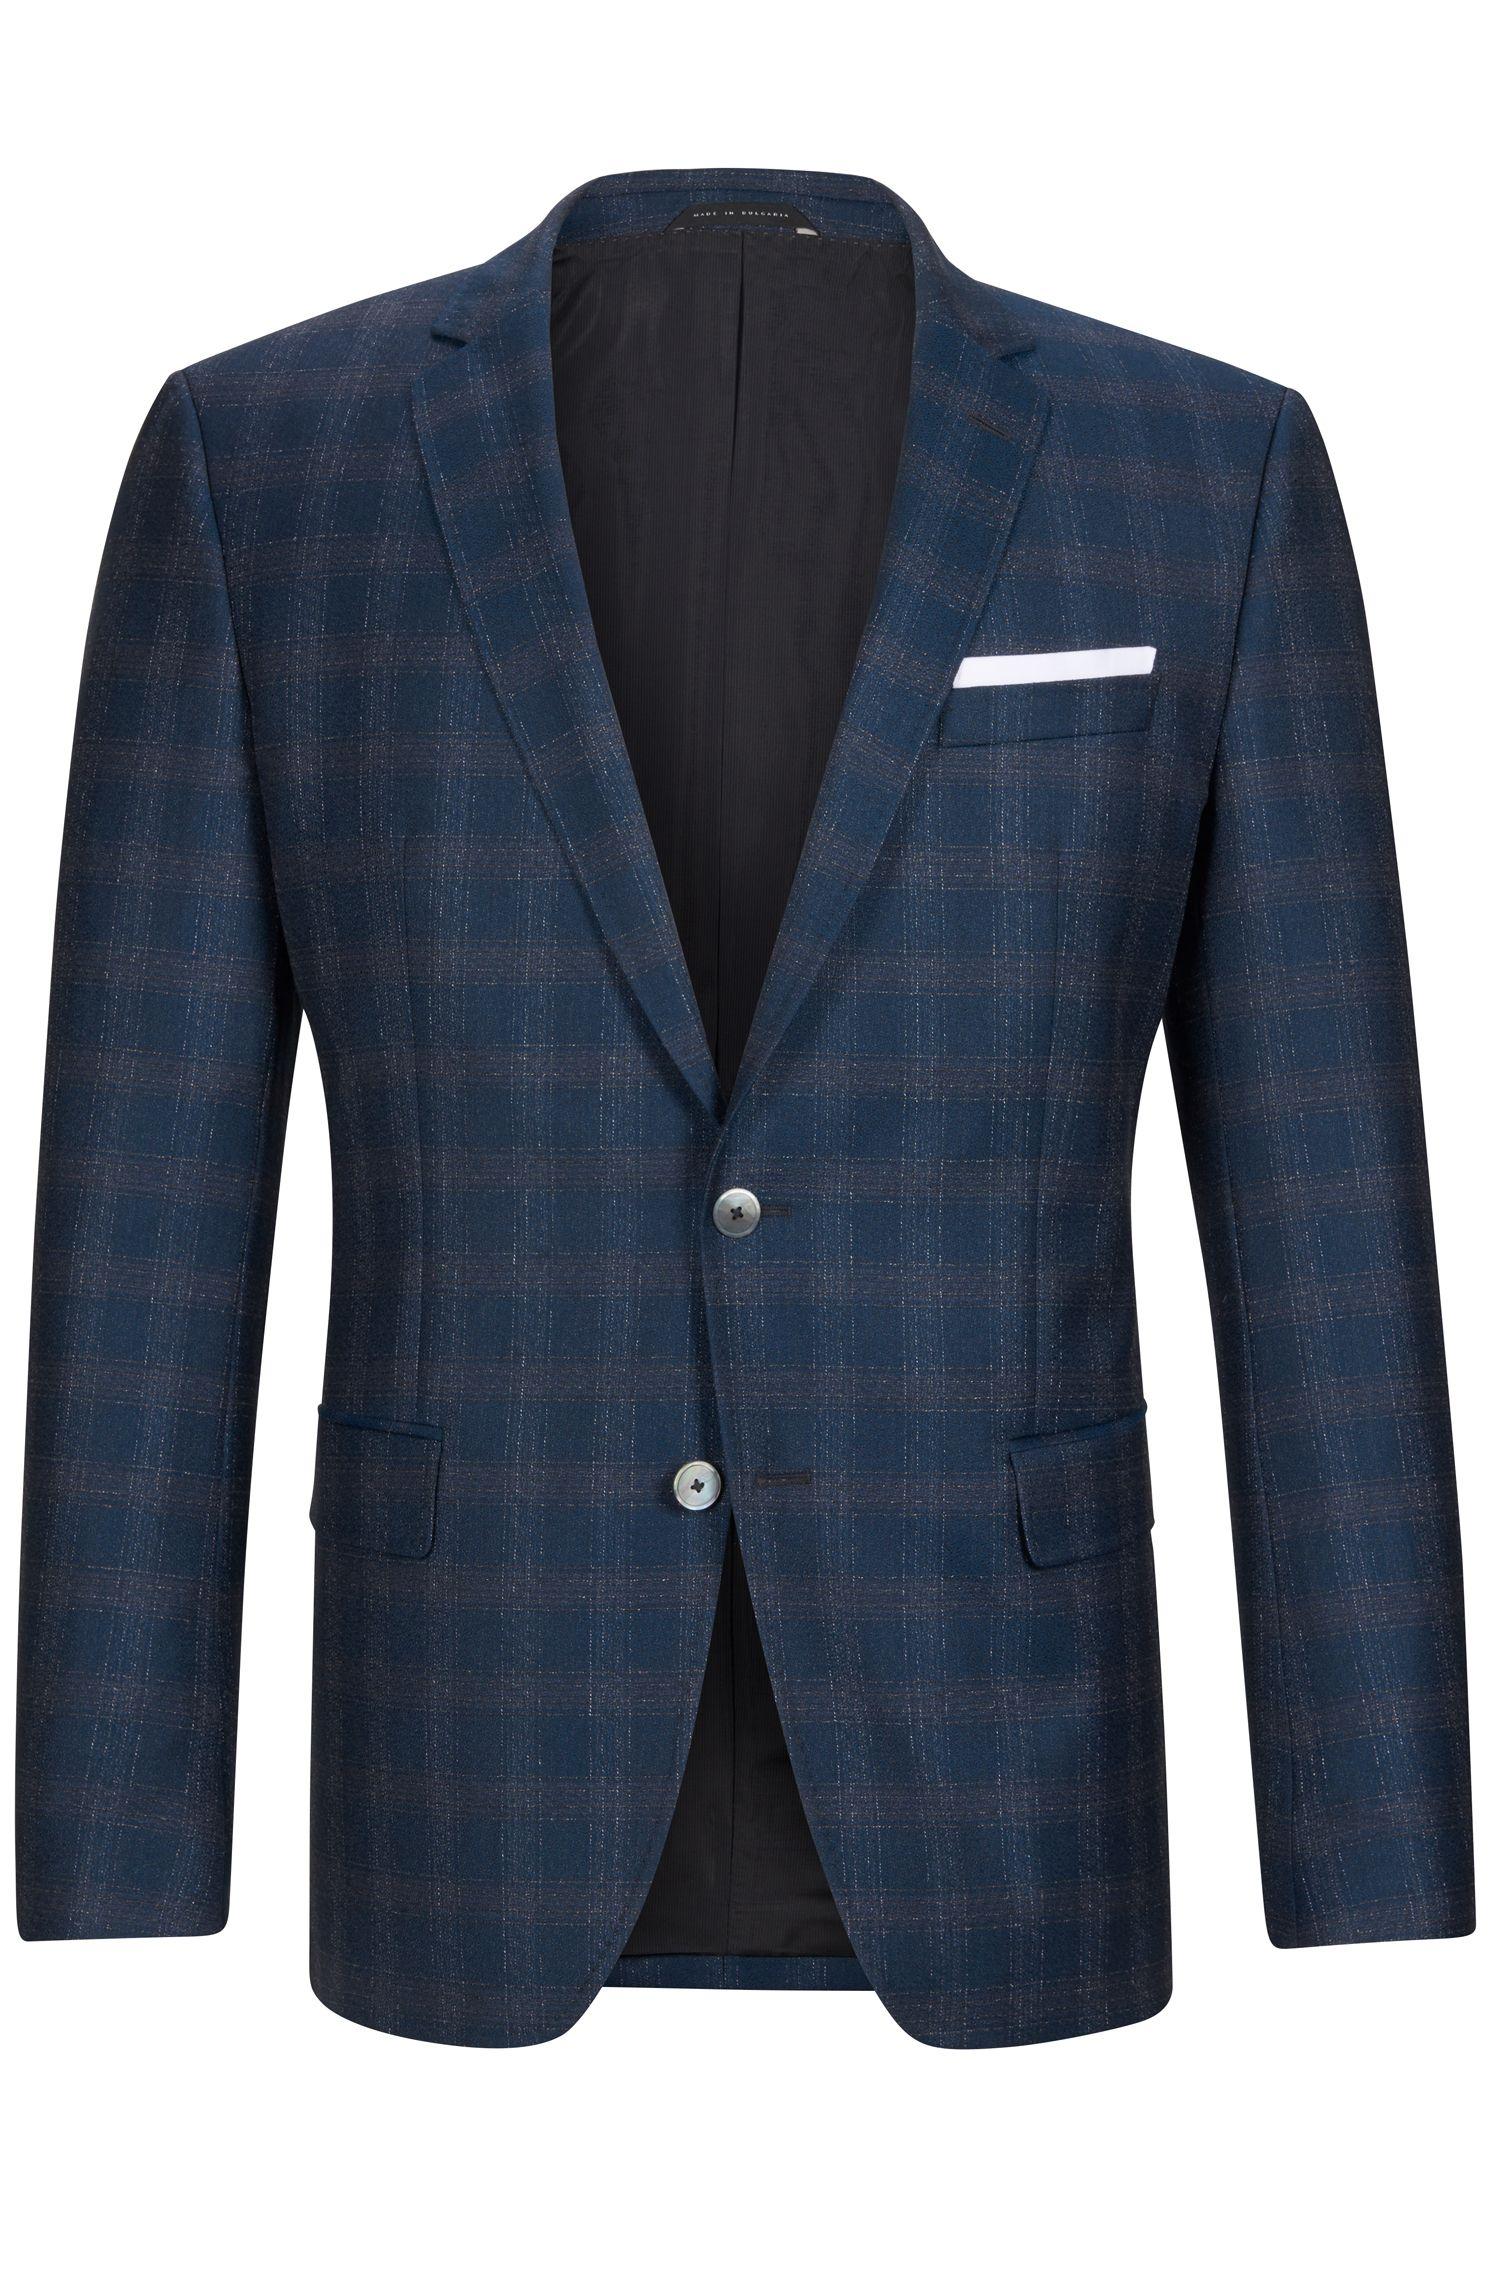 'Hutson' | Slim Fit, Windowpane Italian Virgin Wool Sport Coat